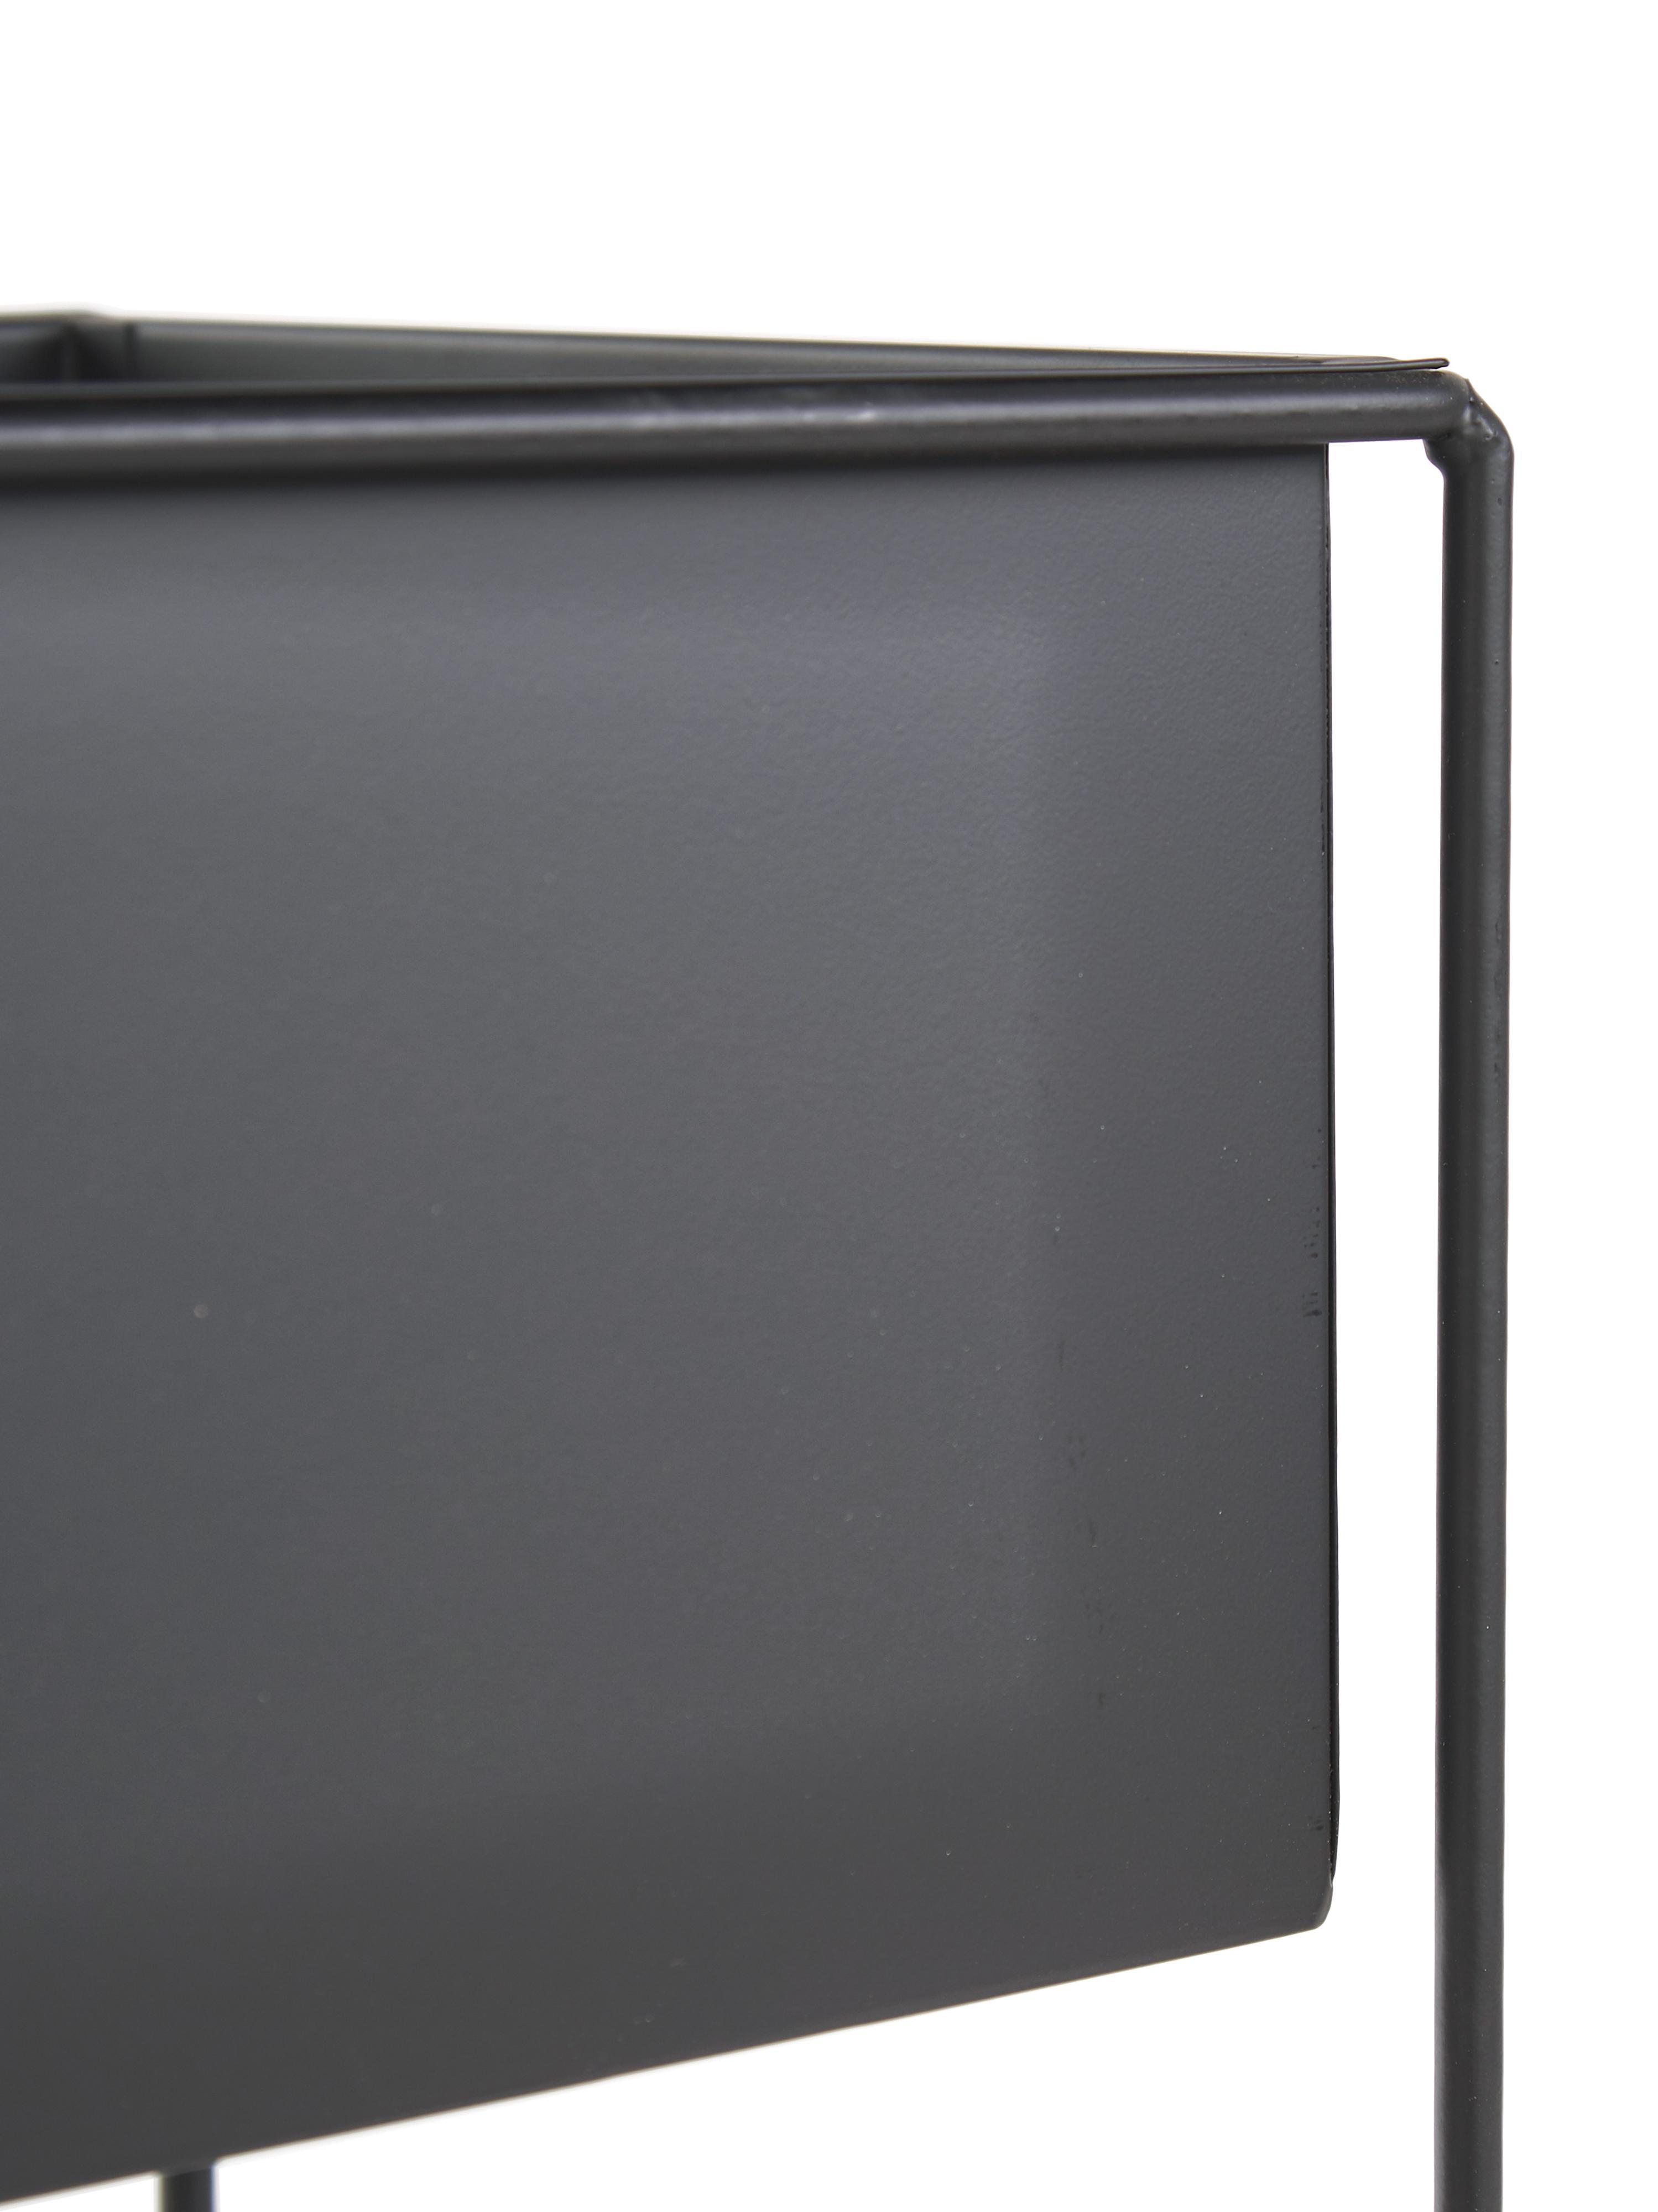 Portavaso Flina, Metallo rivestito, Nero, Larg. 51 x Alt. 65 cm